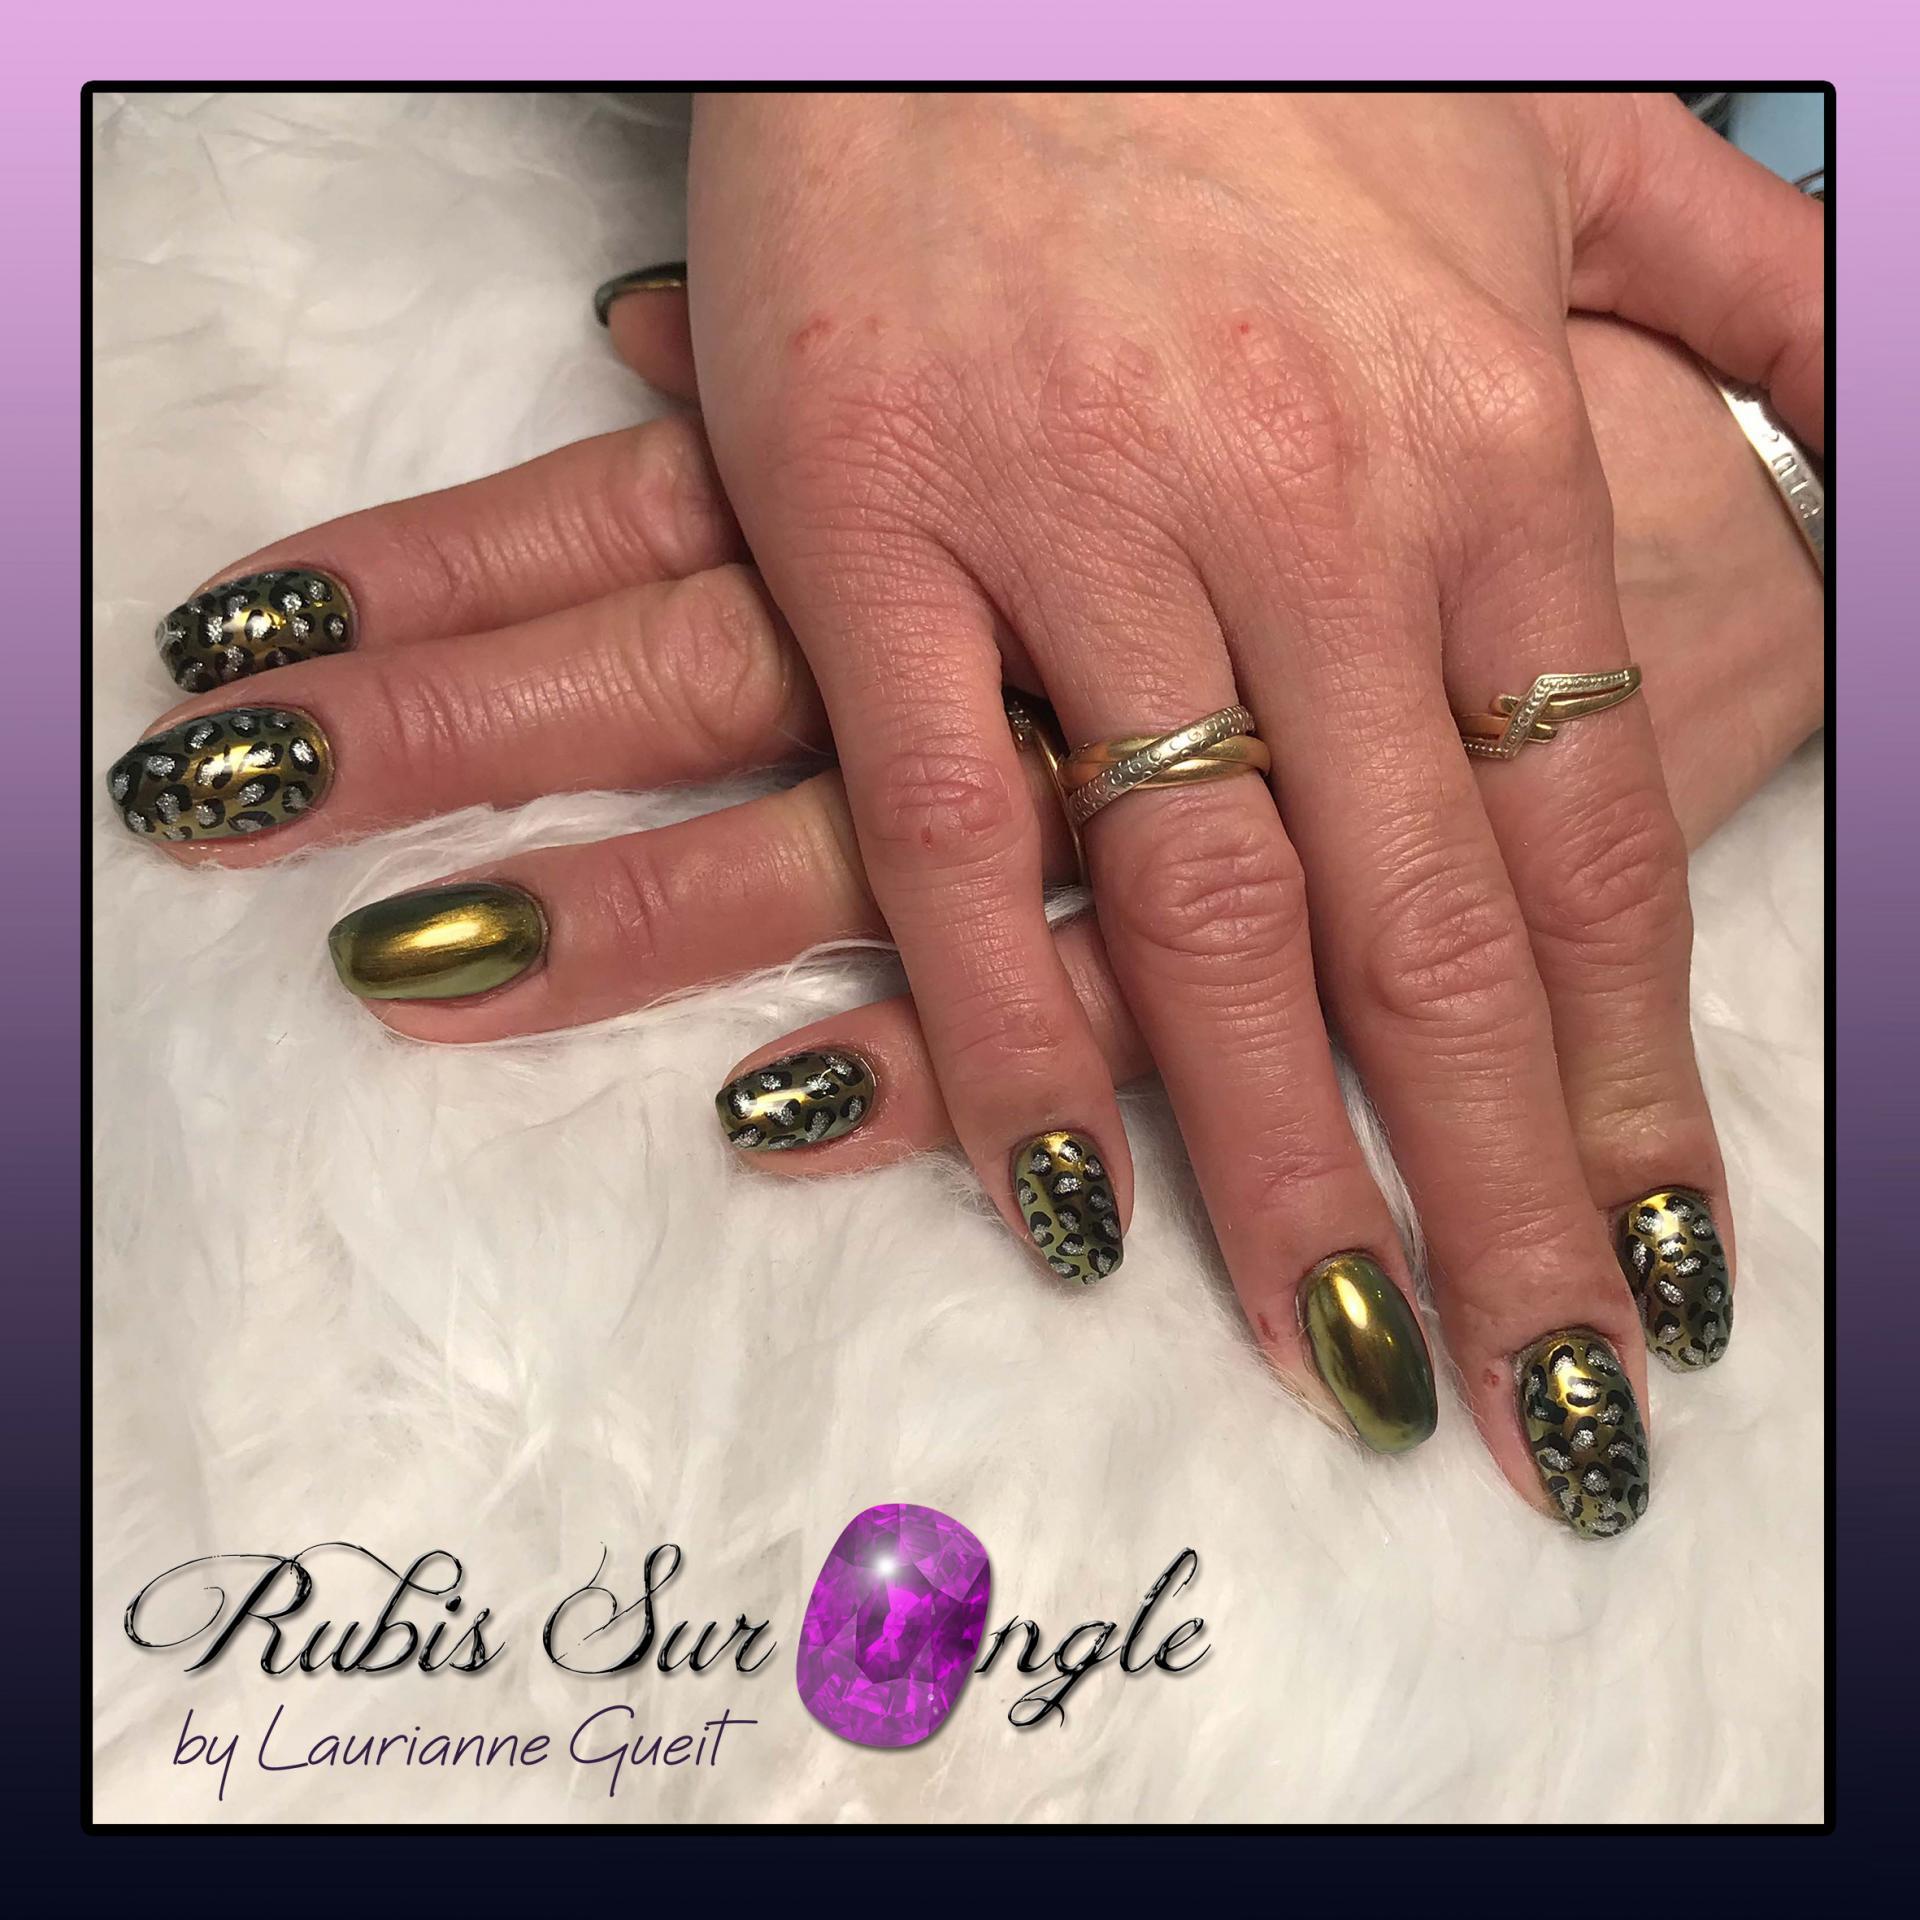 Rubis-Sur-Ongle-Nail-Art-Leopard